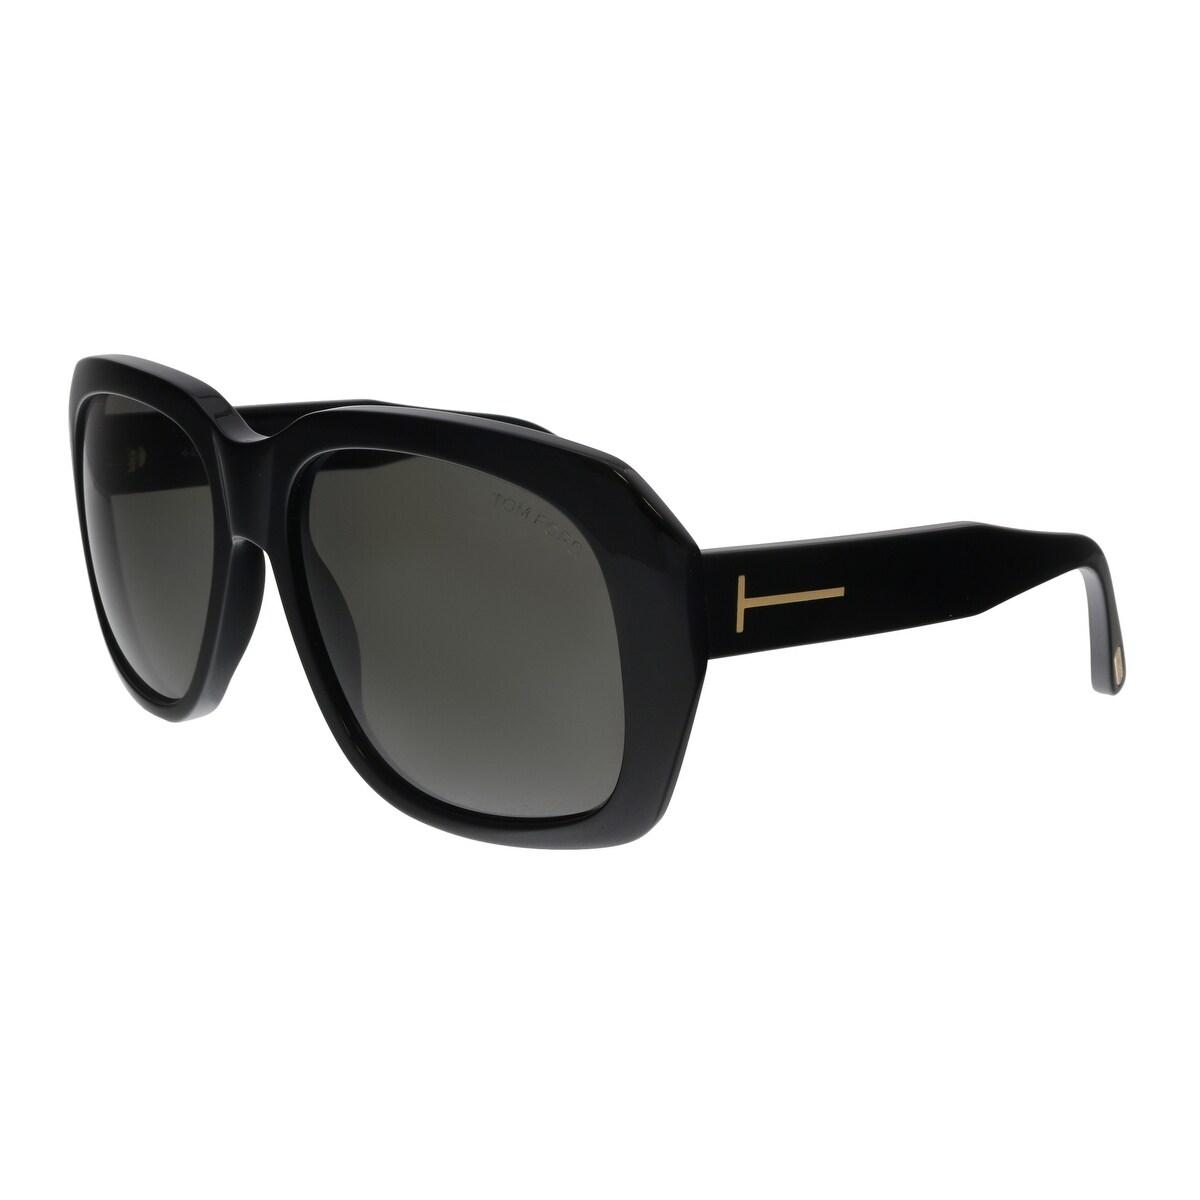 869f2e8e2bc2a Tom Ford Men s Sunglasses